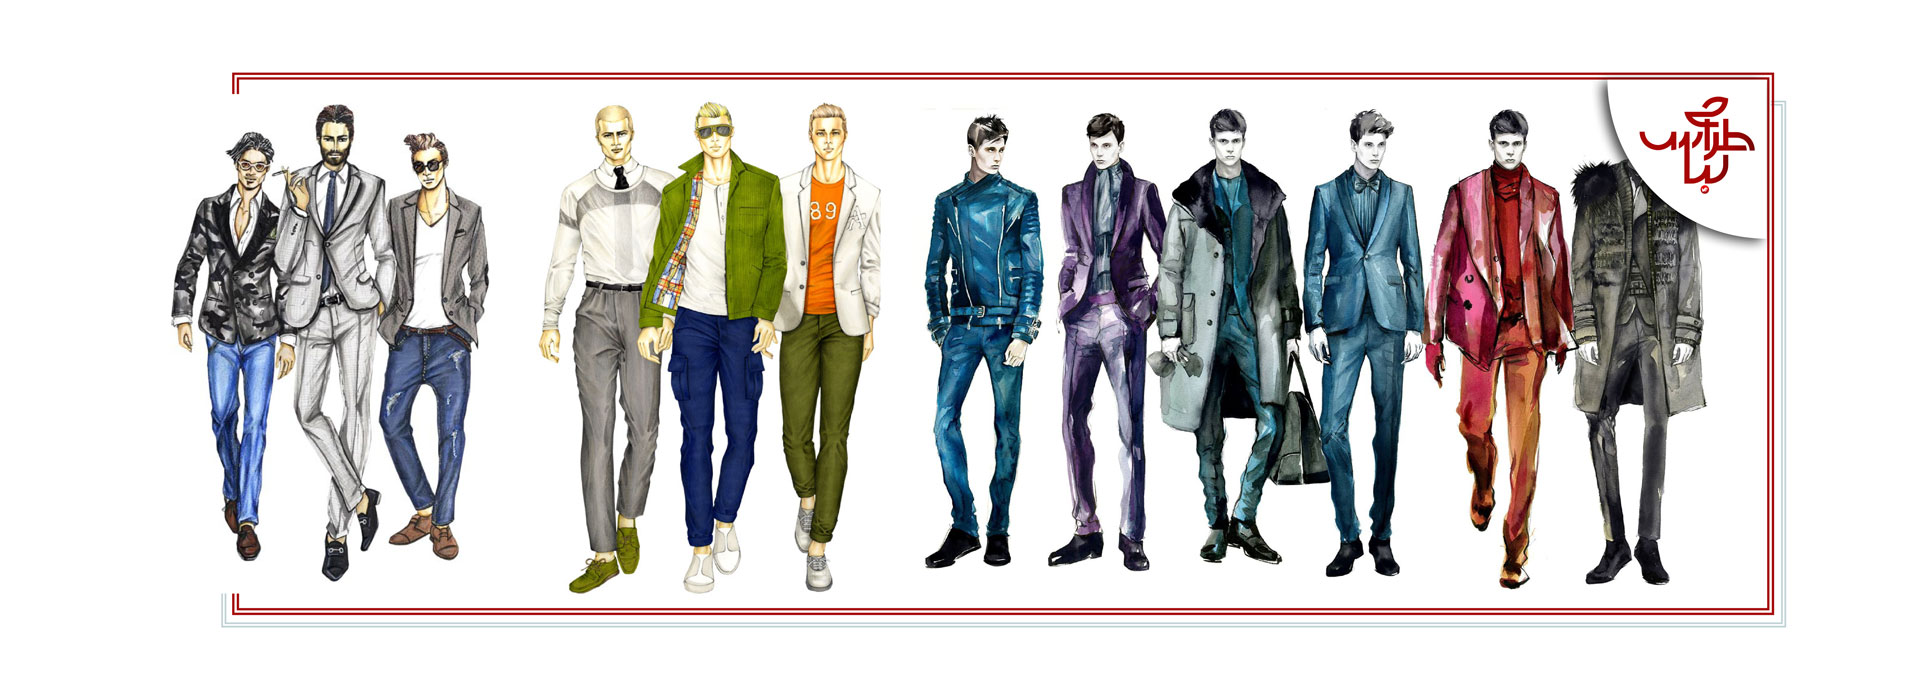 9 clothing men - آموزش طراحی لباس مردانه